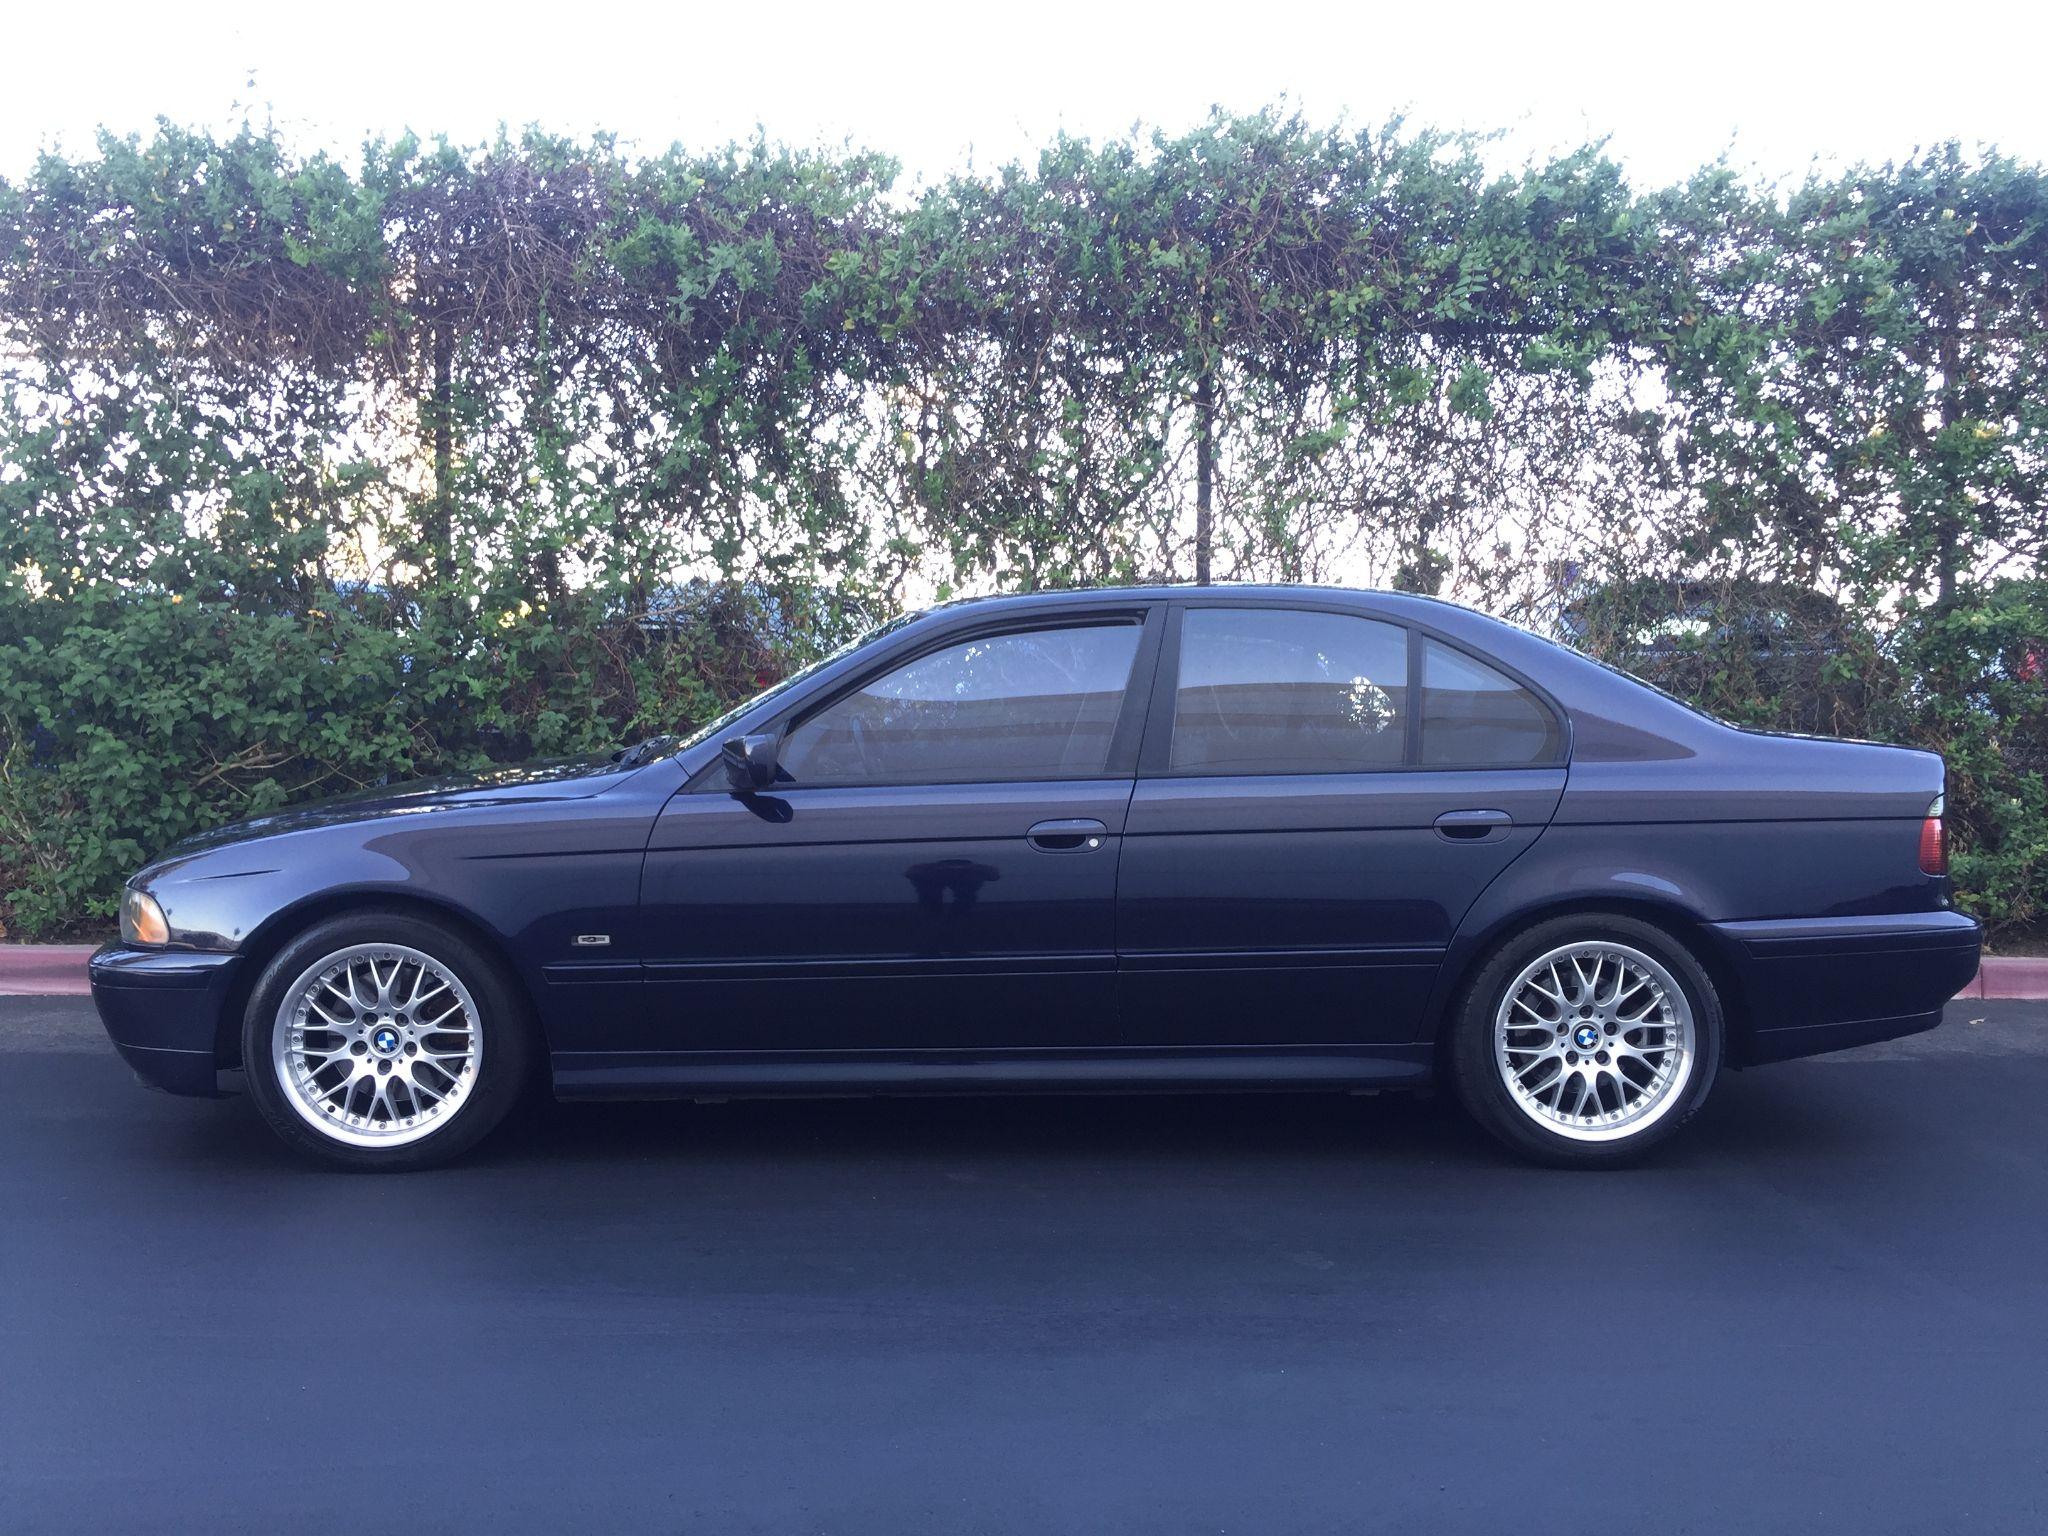 Used 2001 BMW 530i M3 at City Cars Warehouse INC